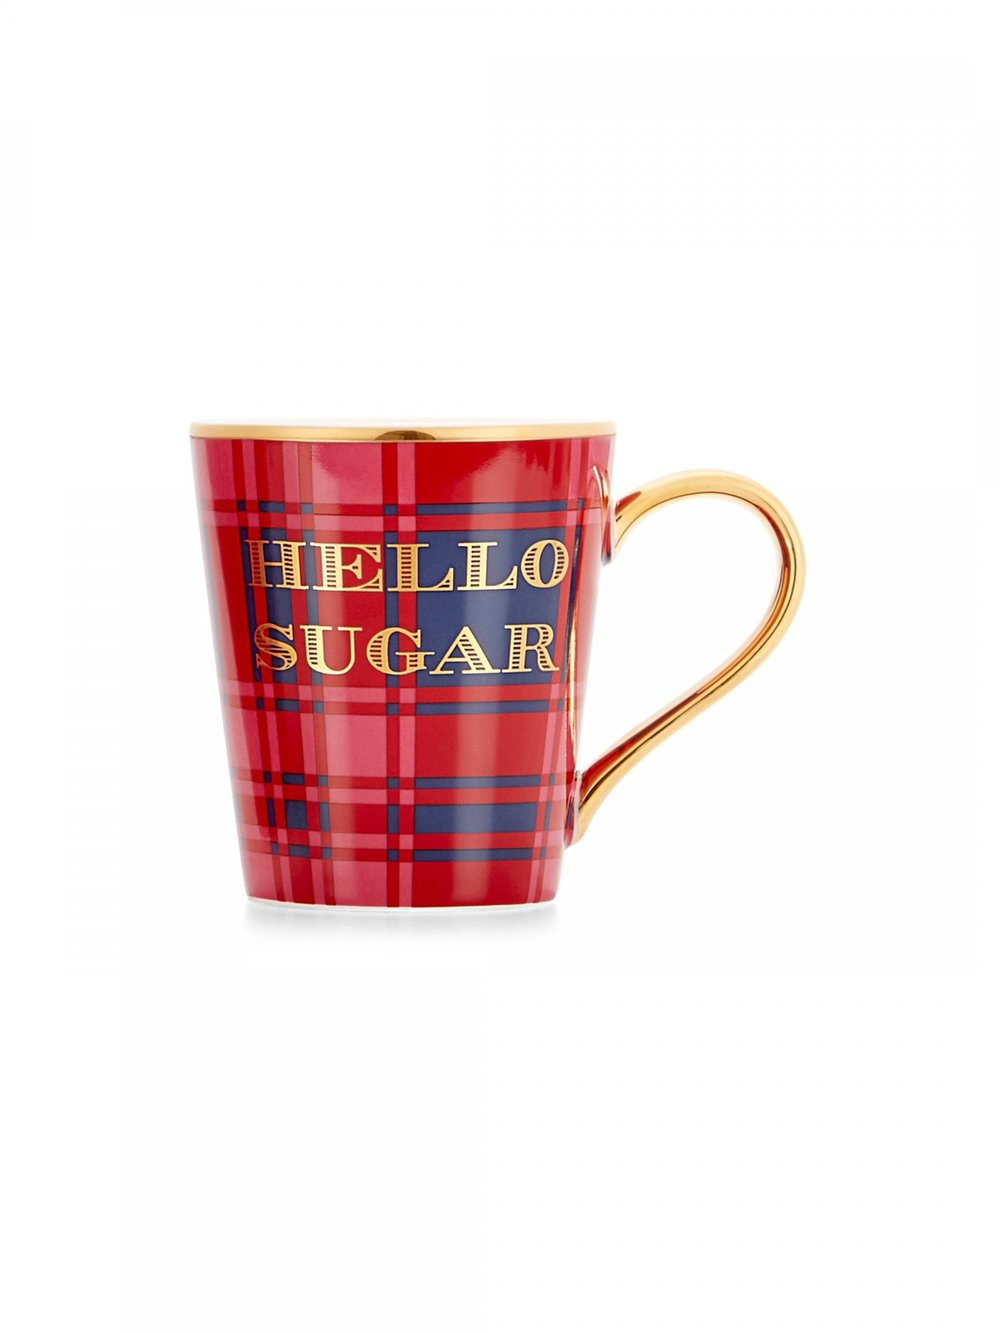 sugar_cup.jpg